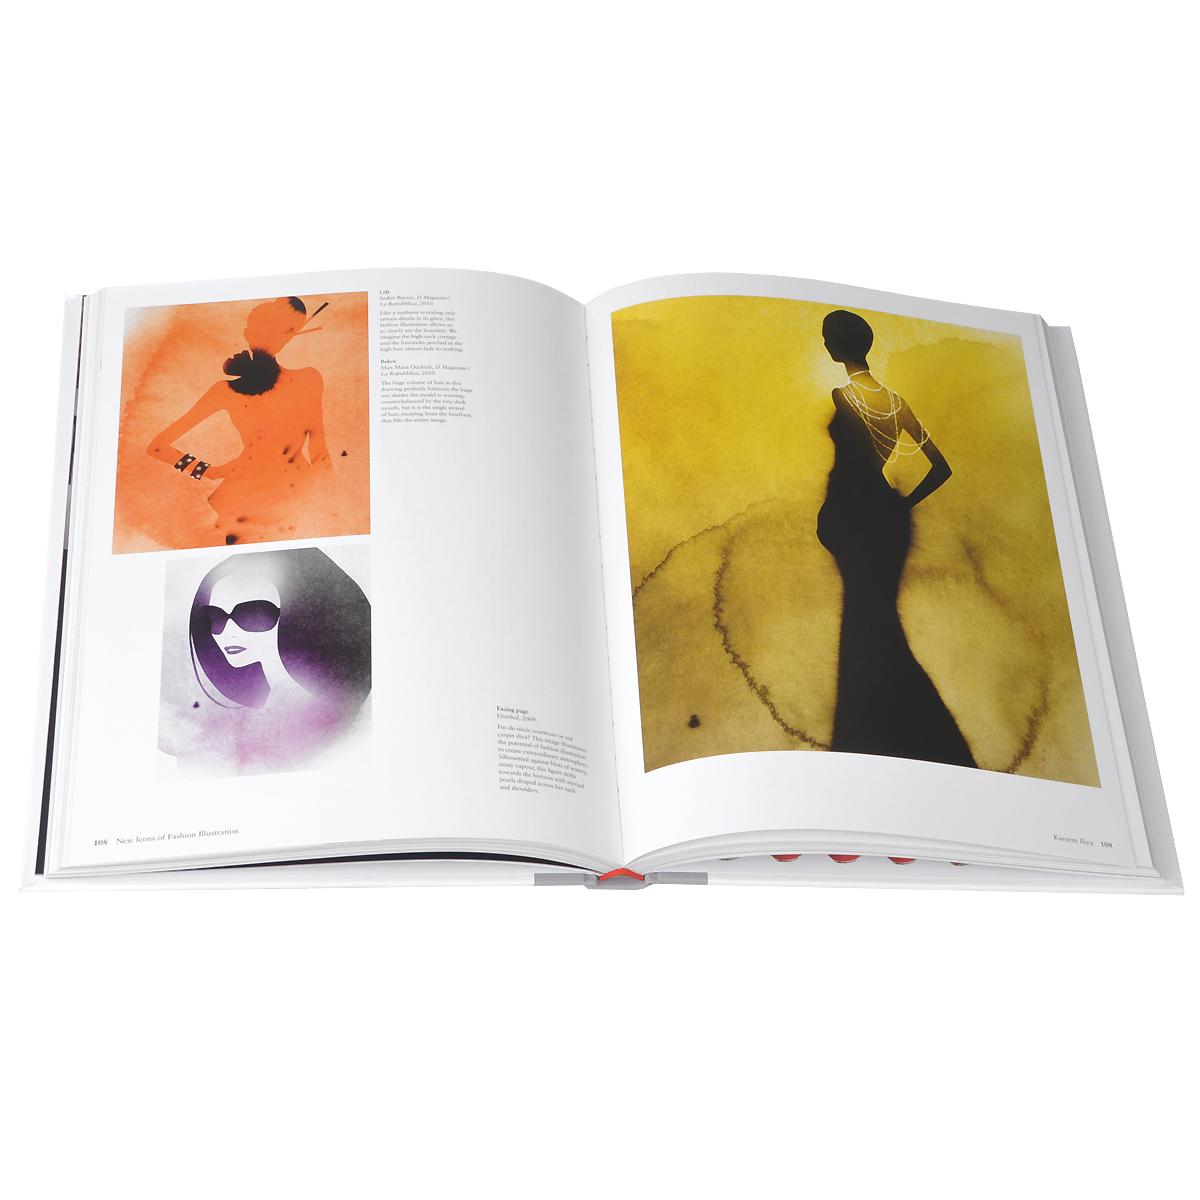 New Icons of Fashion Illustration